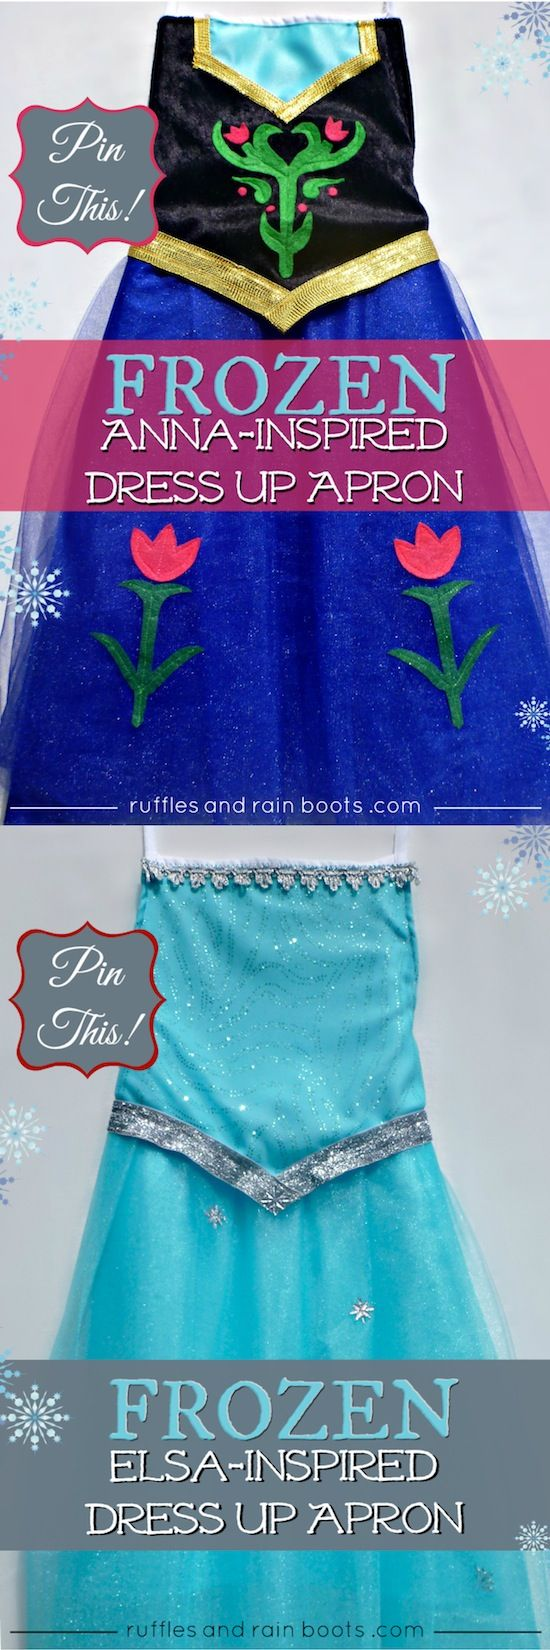 White apron joann fabrics - 25 Best Ideas About Disney Princess Aprons On Pinterest Princess Aprons Disney Princess Dress Up And Disney Aprons